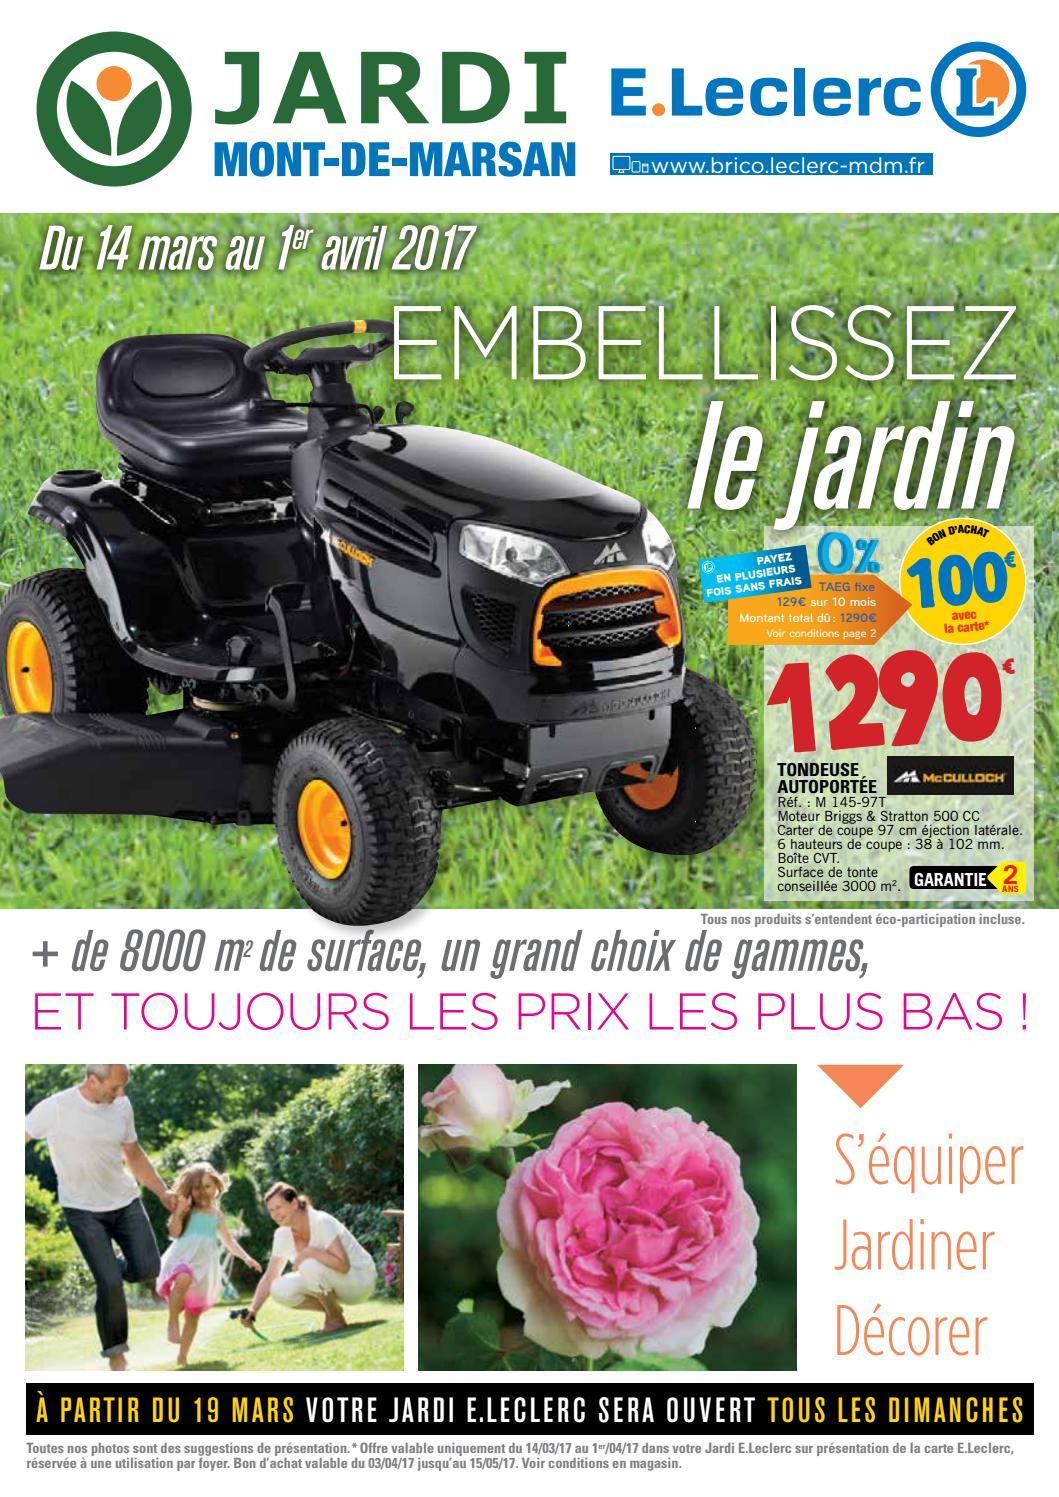 Paf Bd Bbj Mdm Jardi 68P By Bakana Media Agence Digitale - Issuu dedans Abri De Jardin Brico Leclerc